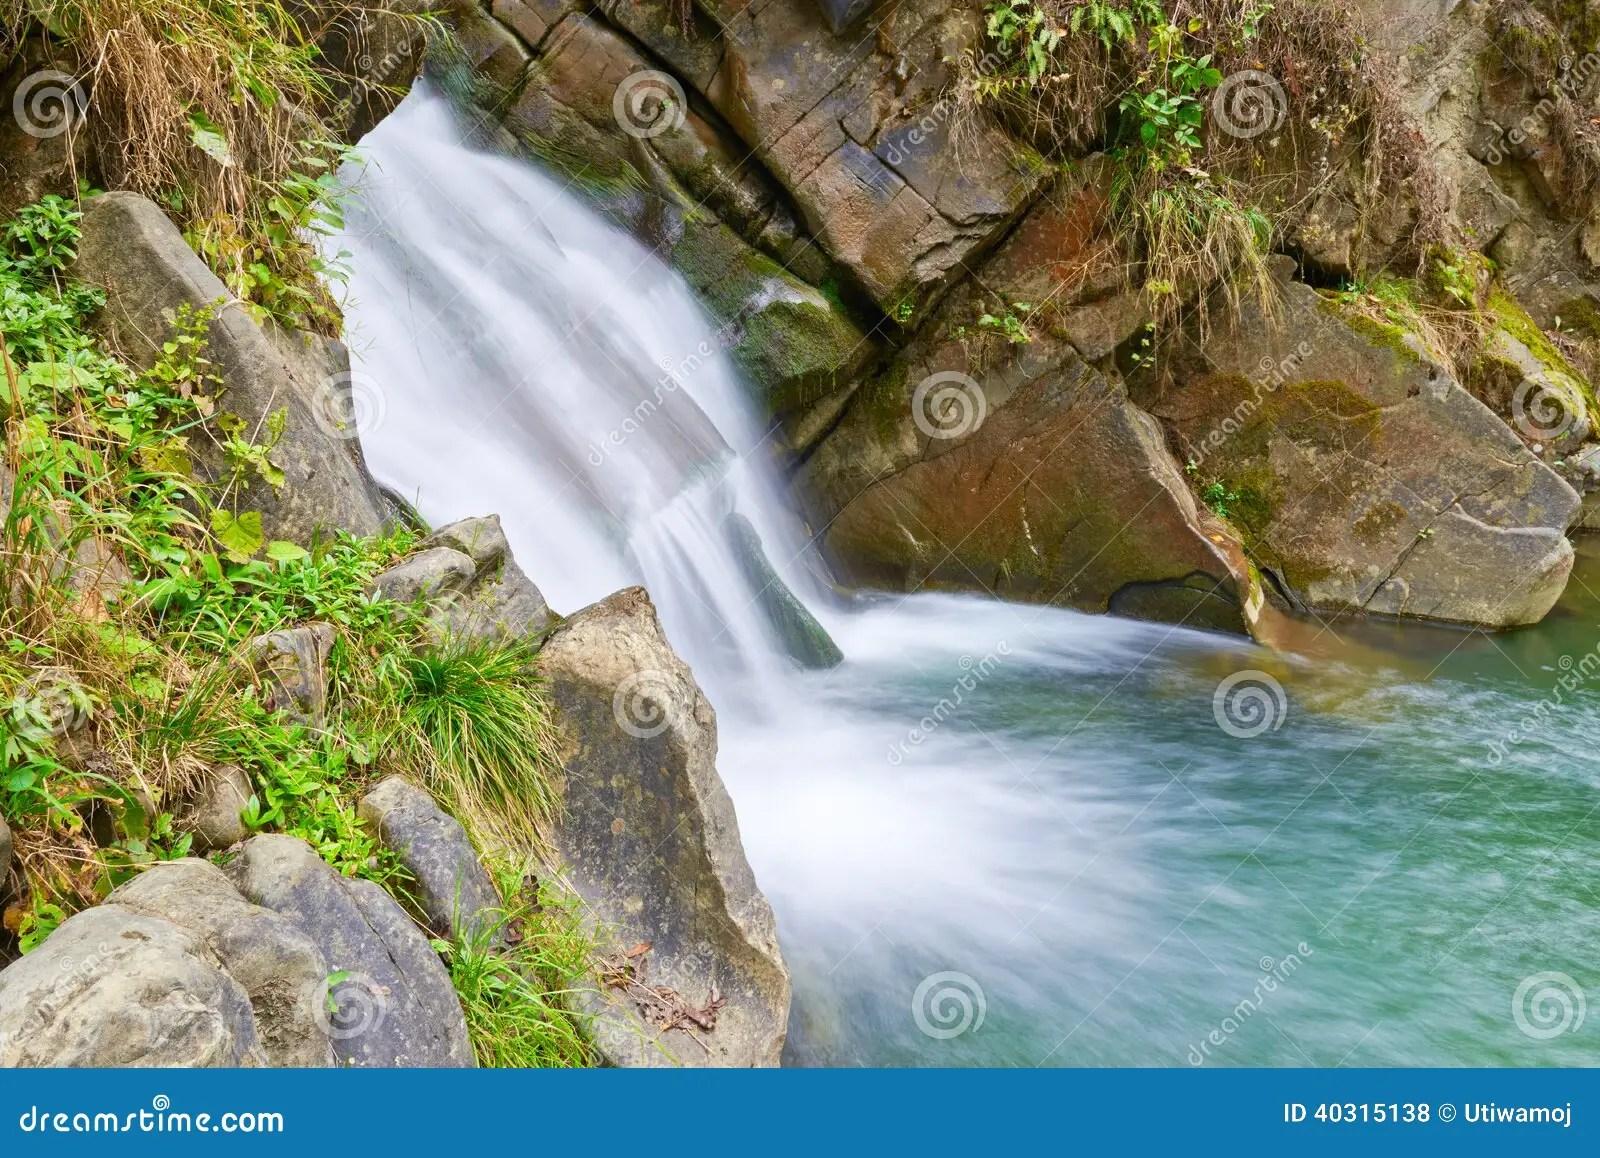 The Zaskalnik Waterfall Natural Source Of Water Stock Photo